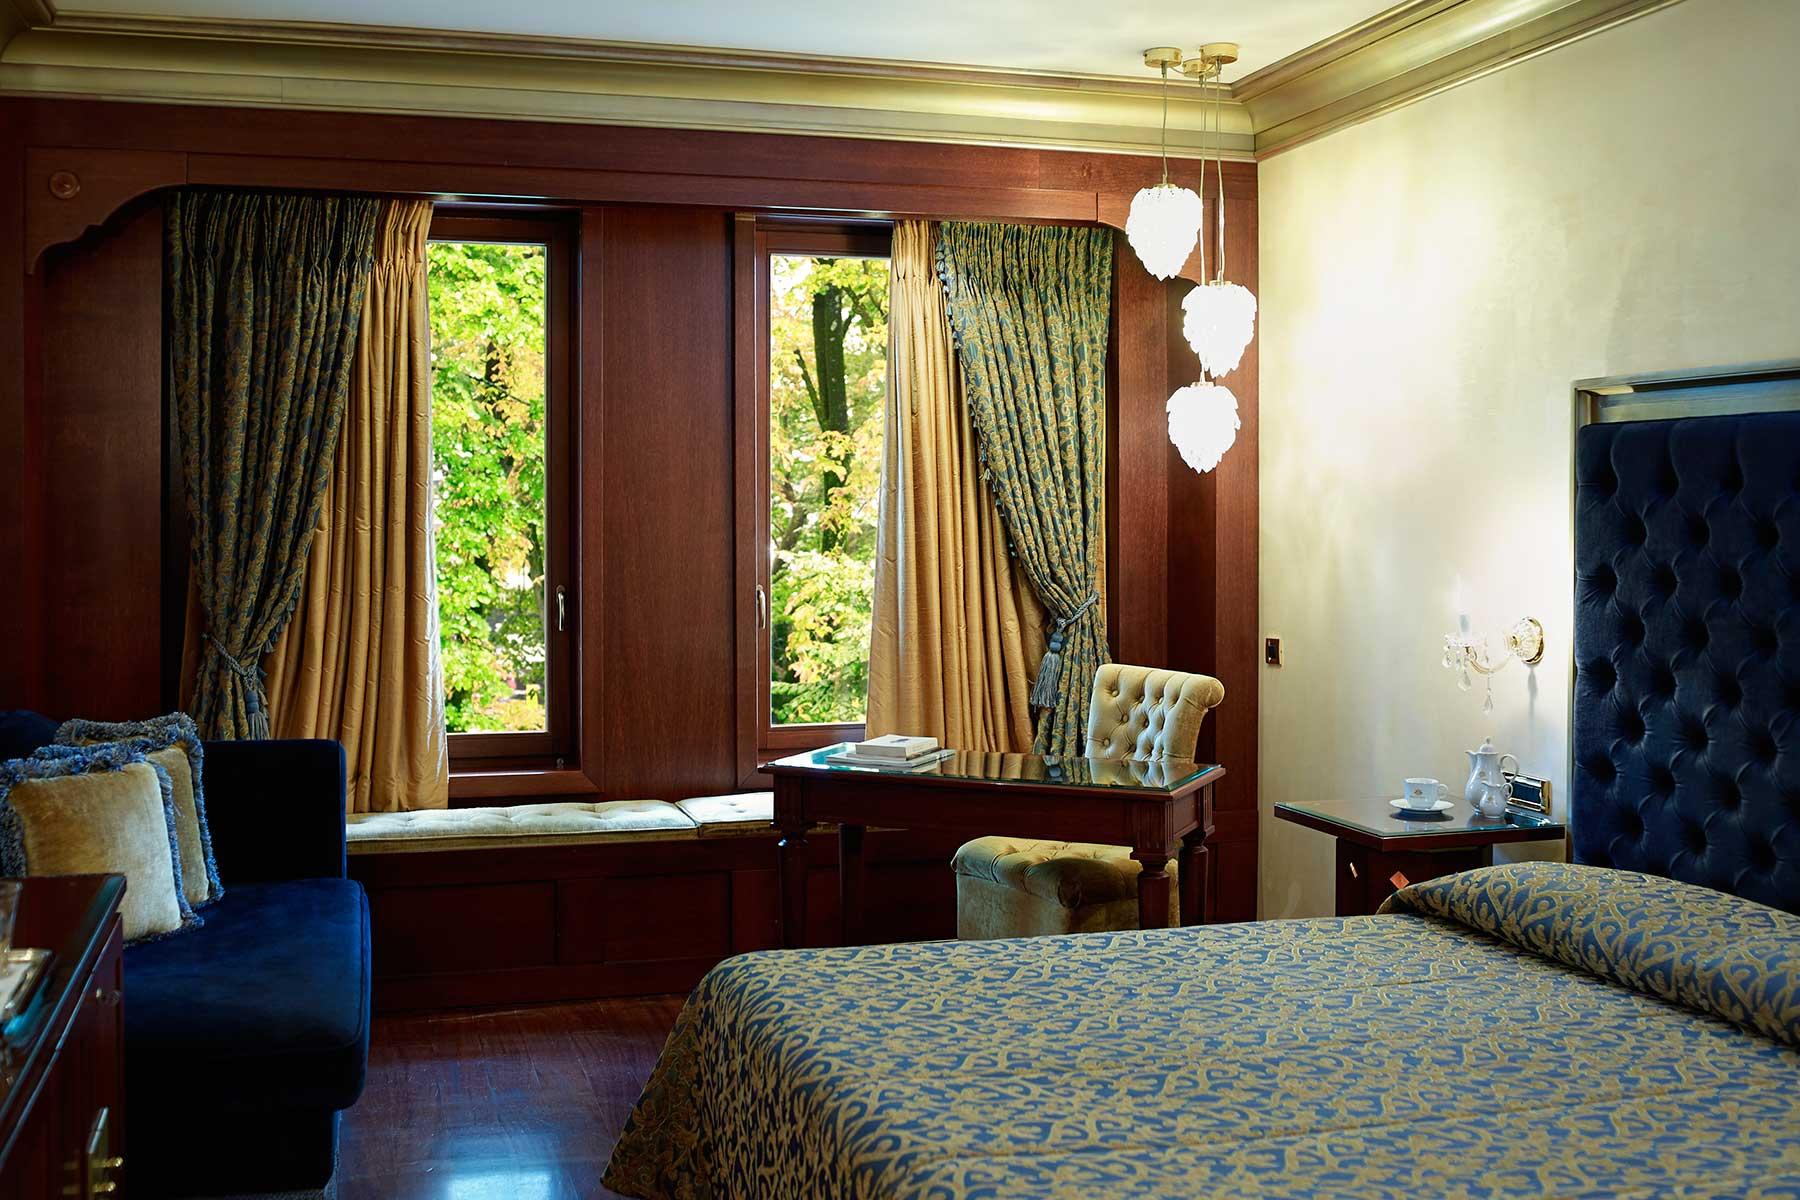 1_grand-serai-standart-double-room-ioannina-greece-1.jpg